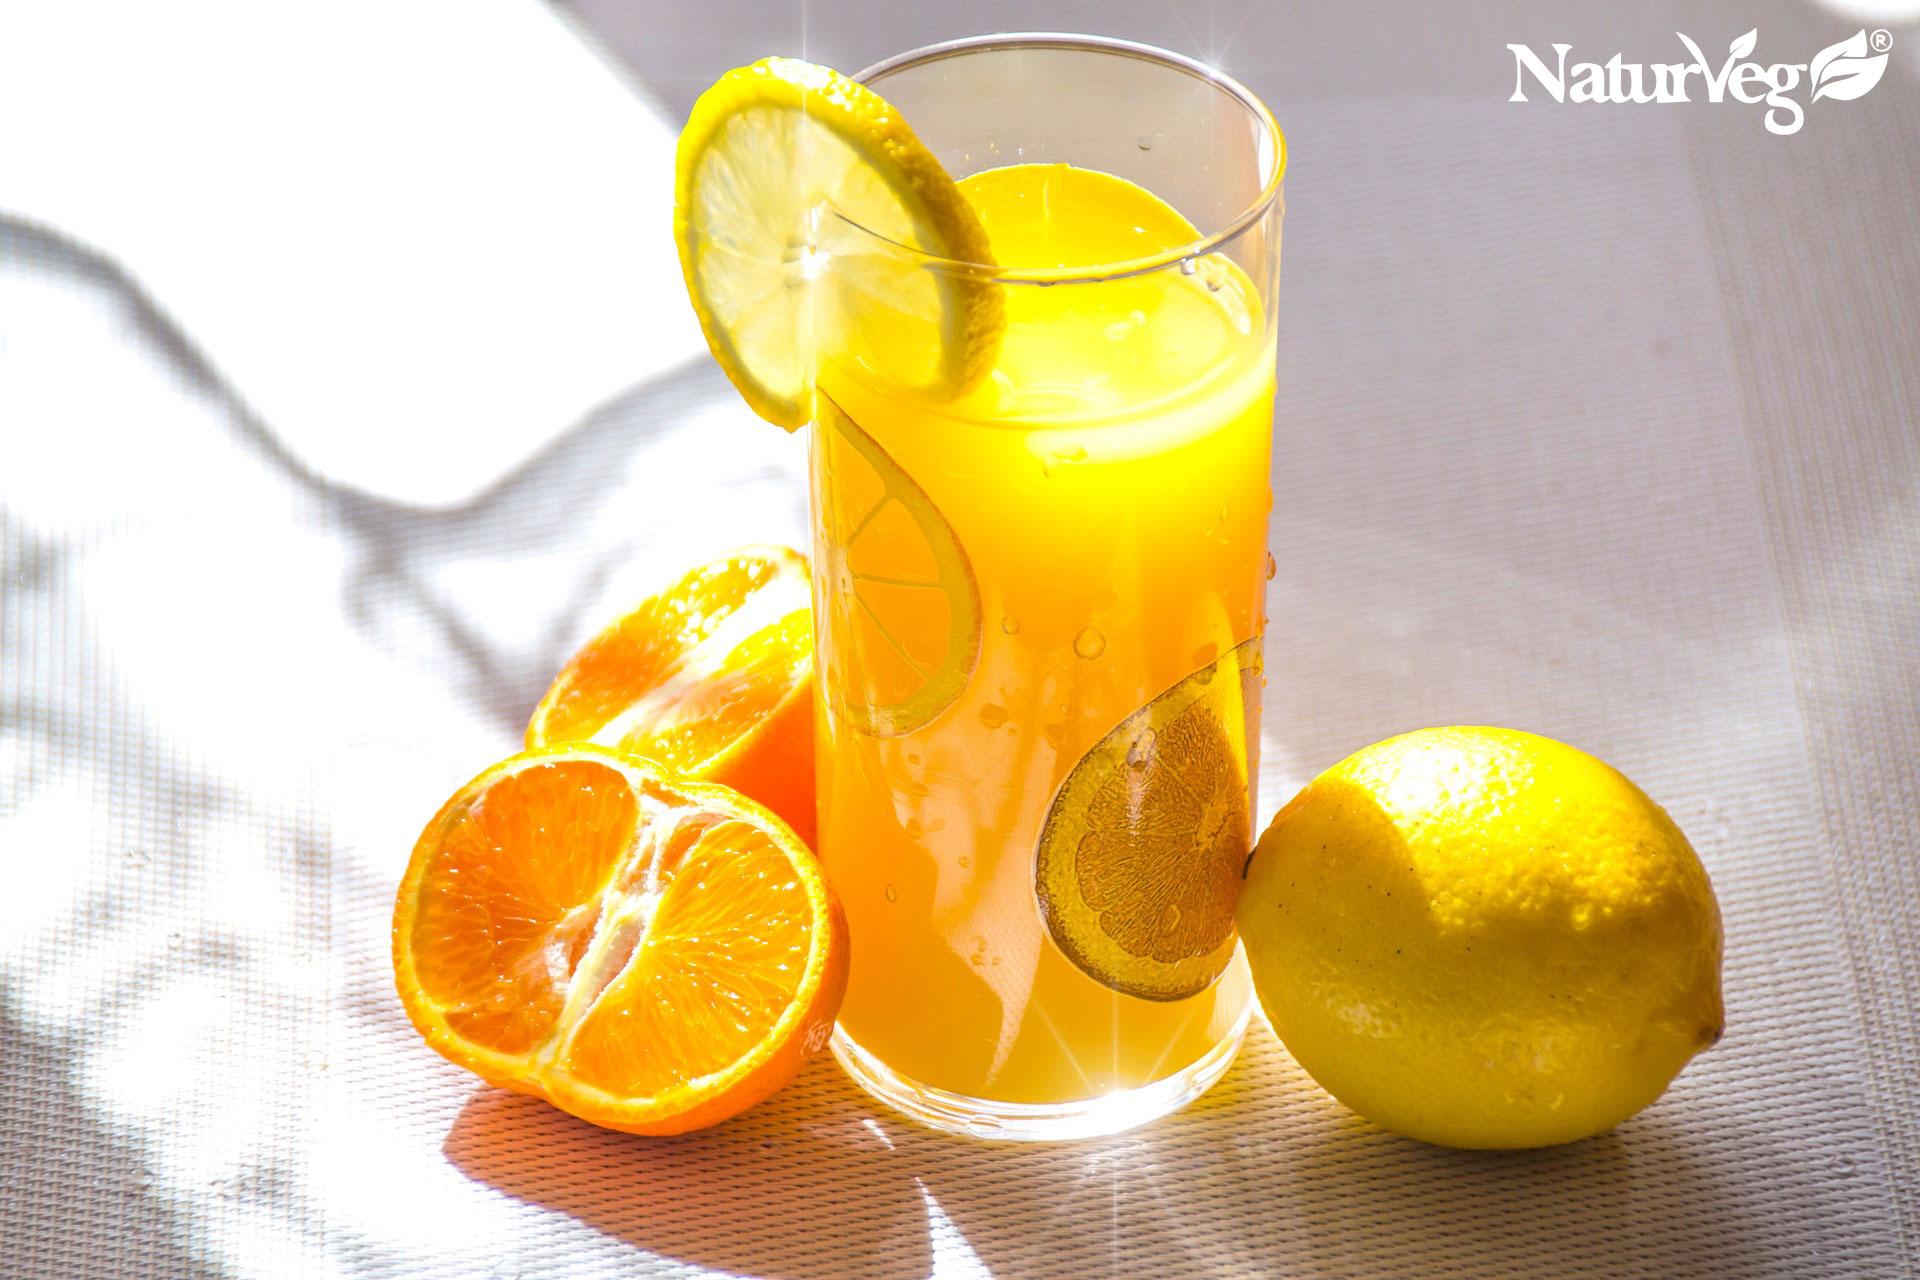 Differenze tra vitamine naturali e sintetiche   Naturveg